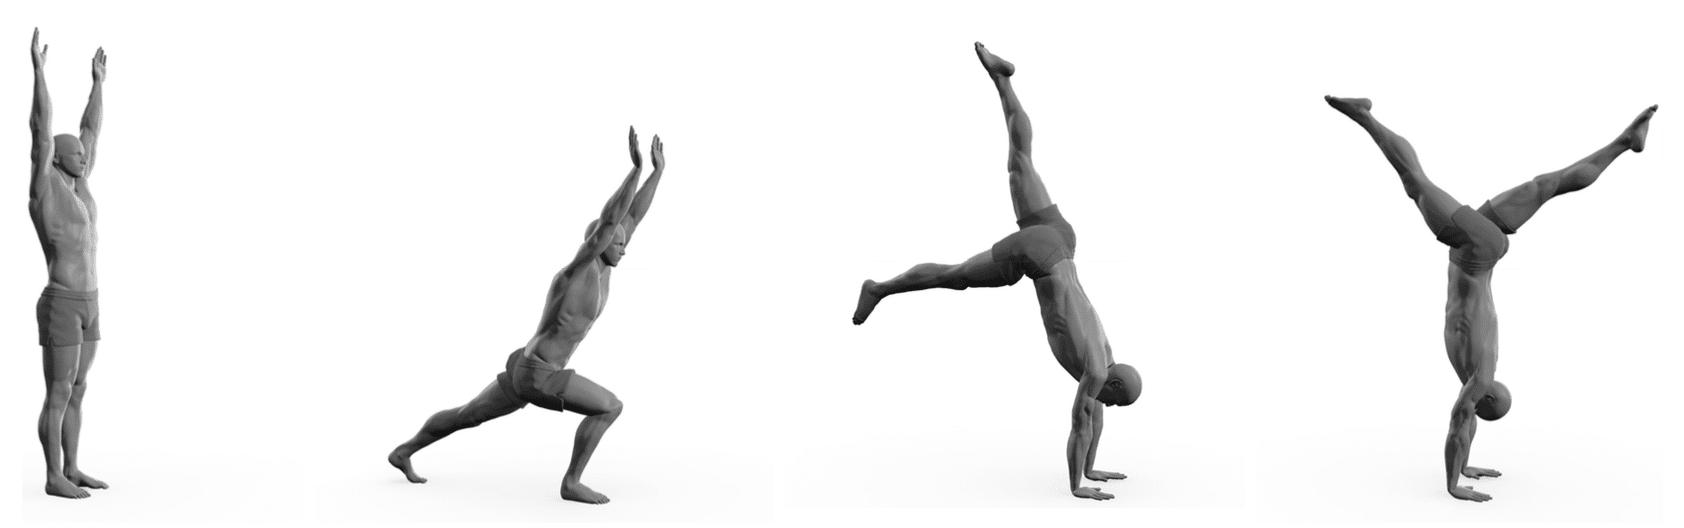 Man doing kicking up exercise on gound illustration.